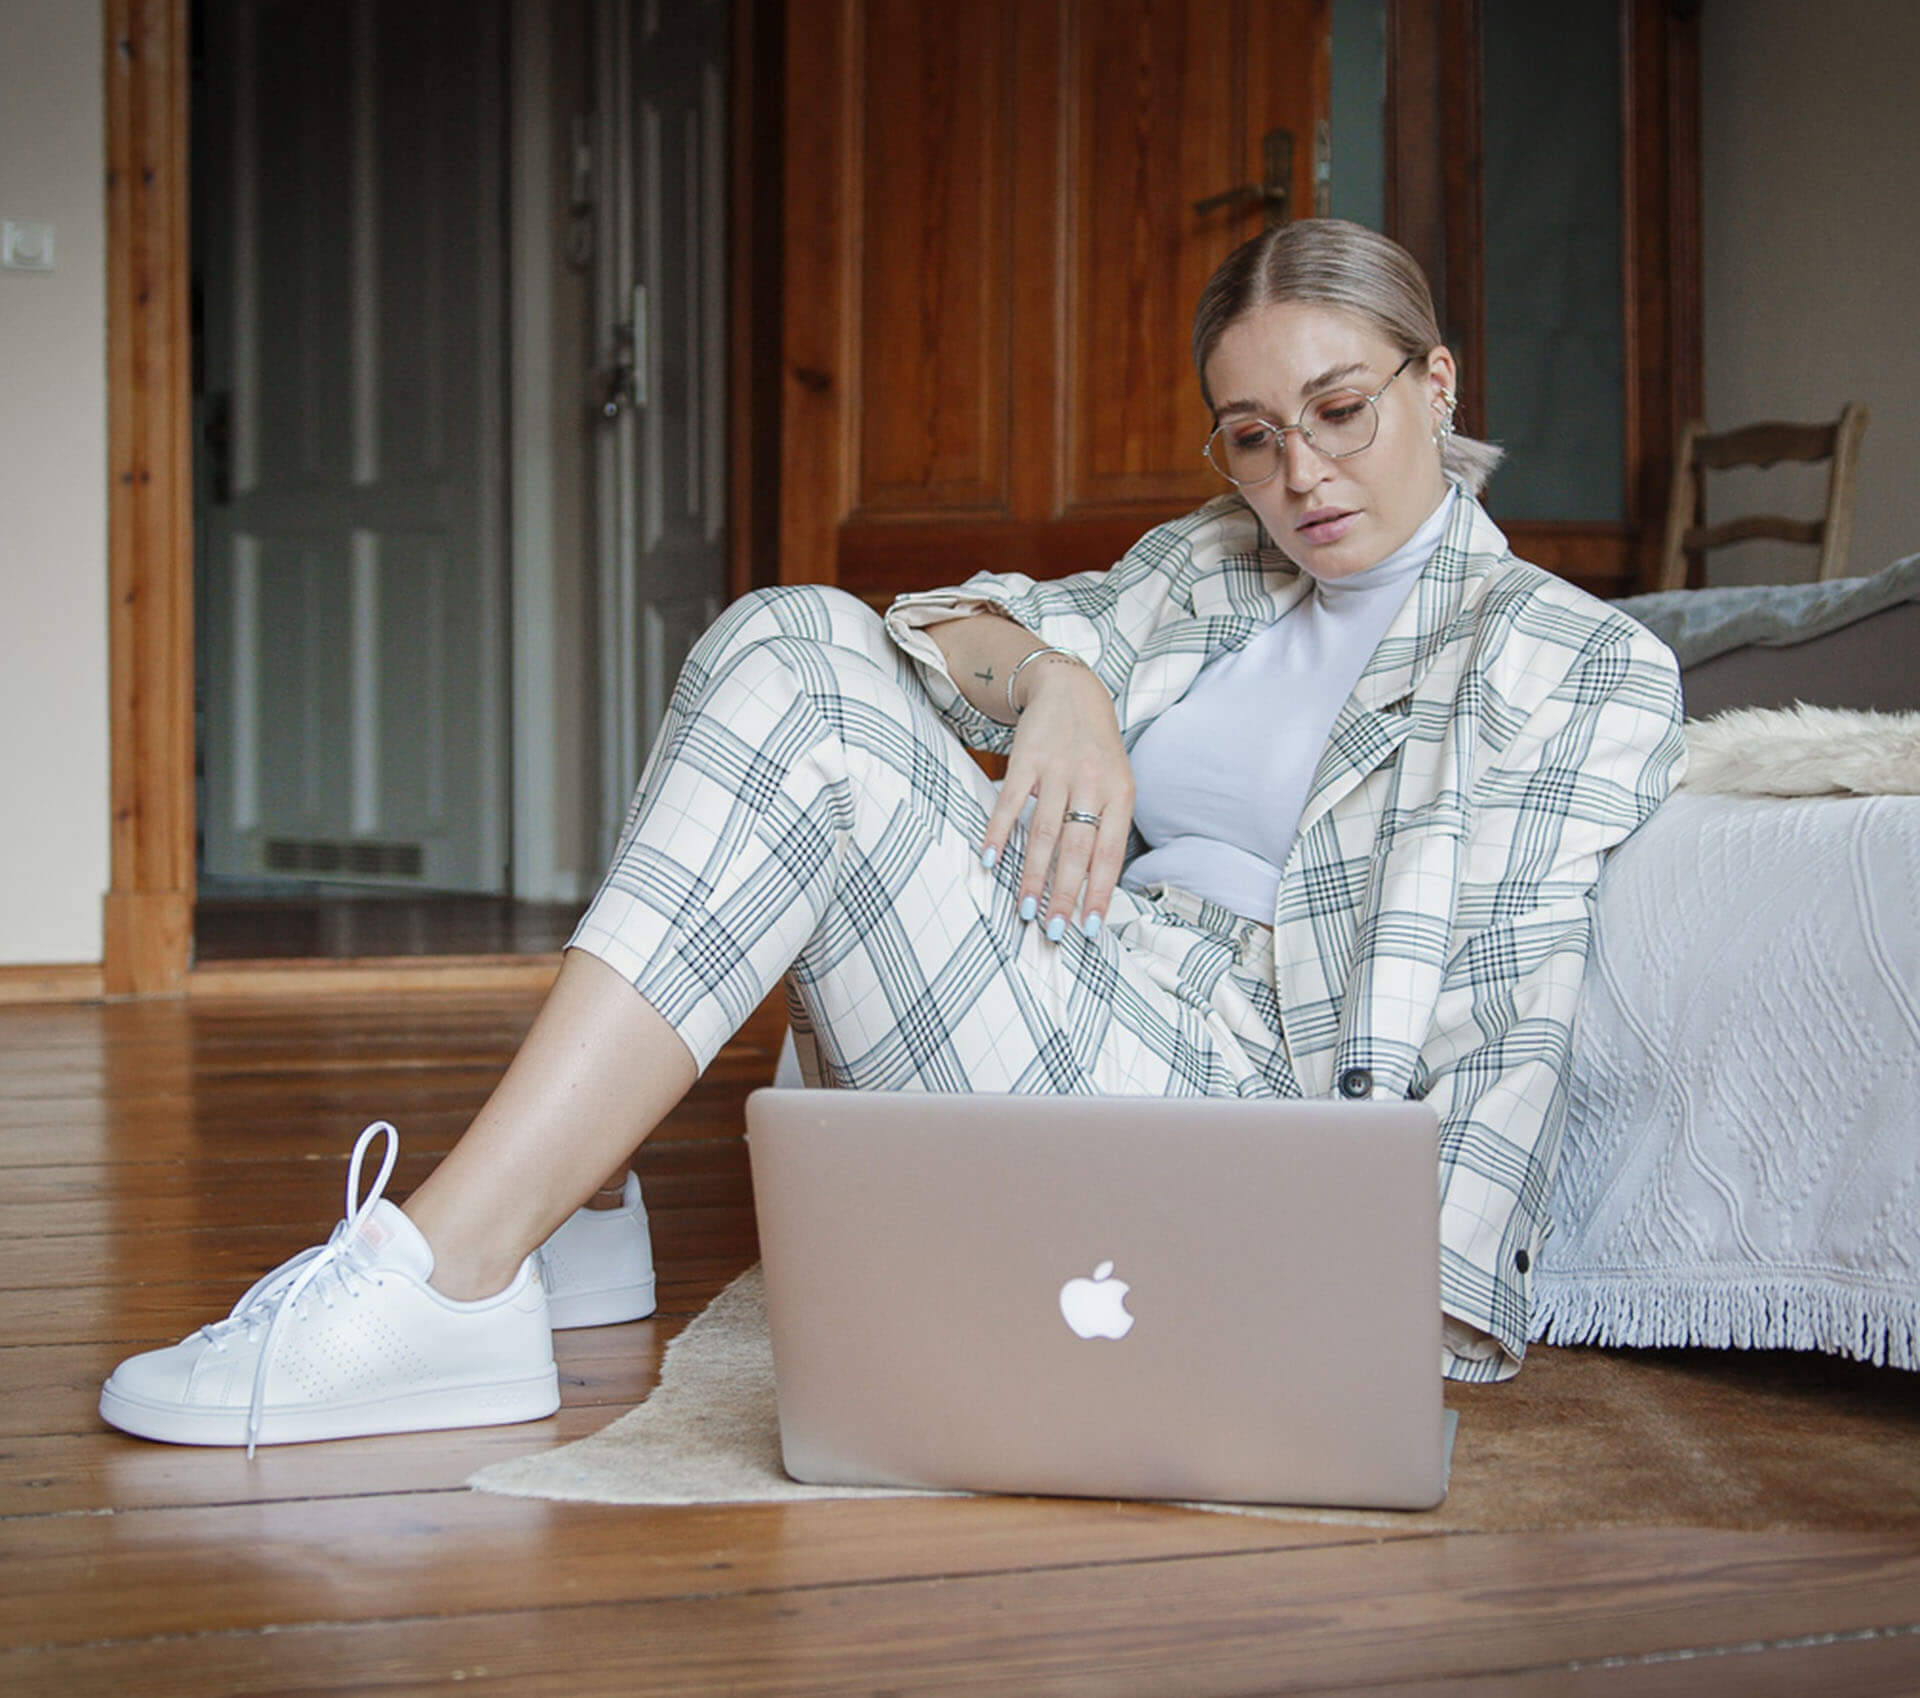 Marken Sneaker Deichmann, @lauralamode, Adidas Advantage Base